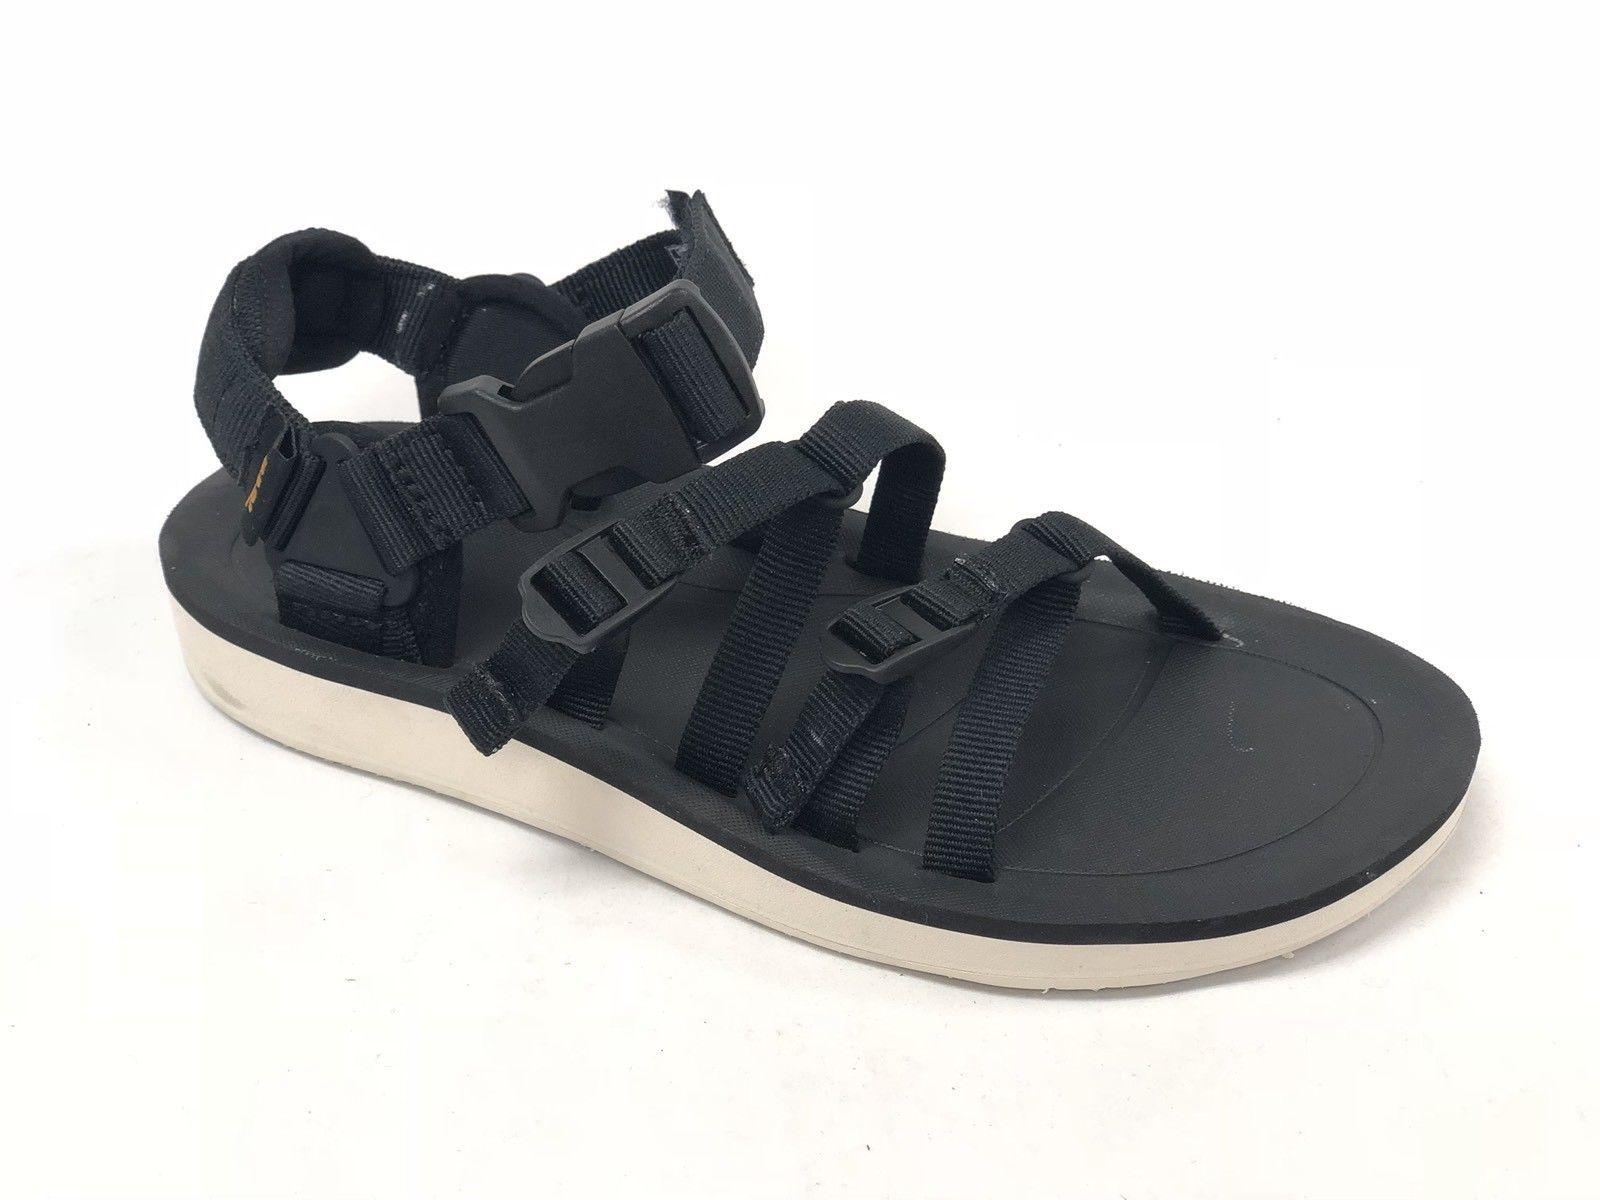 TEVA TORIN 6584 Black Ankle Strap Sport Hiking Water Sandals Mens Size 12